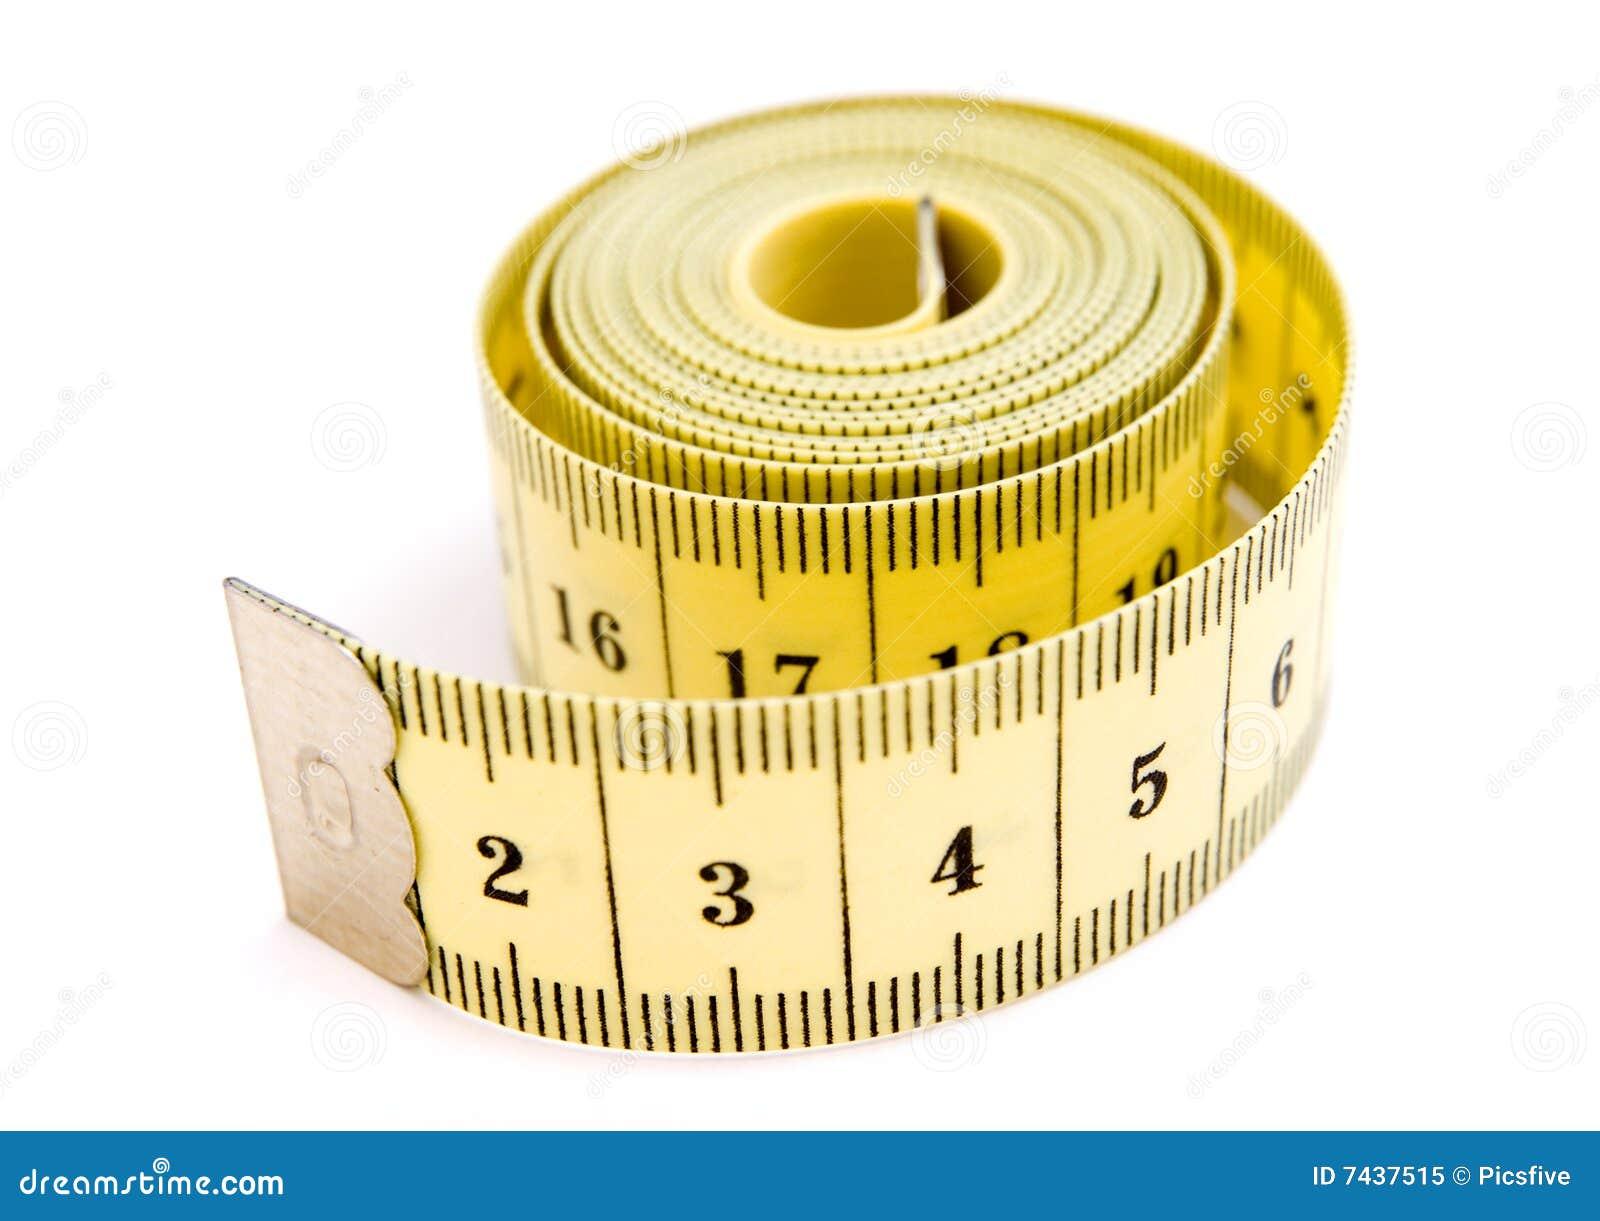 worksheet Centimeter centimeter new 1 royalty free stock photo image 7437515 1